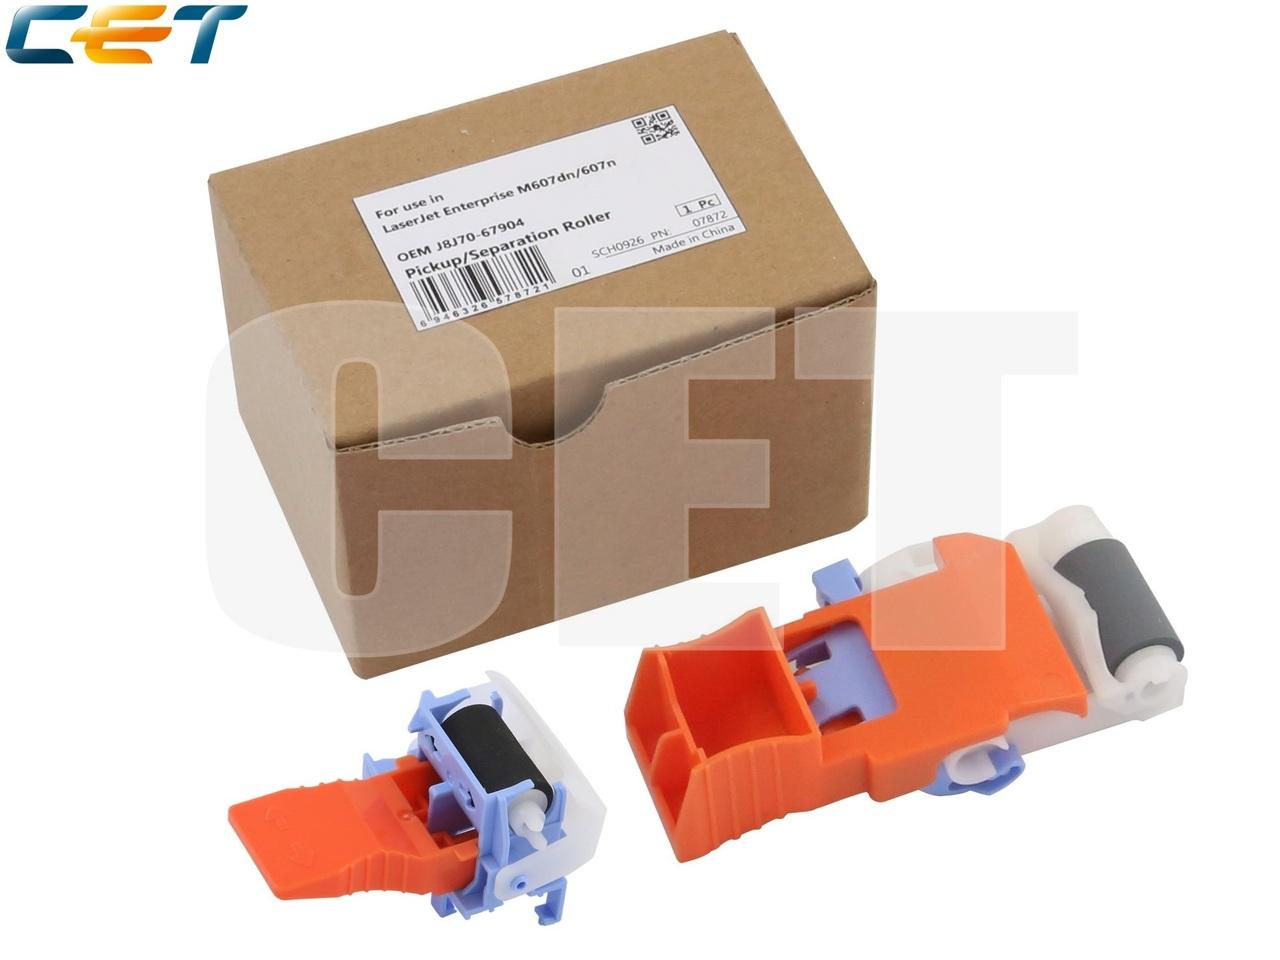 Комплект роликов подхвата/отд. 2-го лотка J8J70-67904 дляHP LaserJet Enterprise M607dn/608dn/609dn/MFP M631dn/632h(CET), CET7872, CET7872R